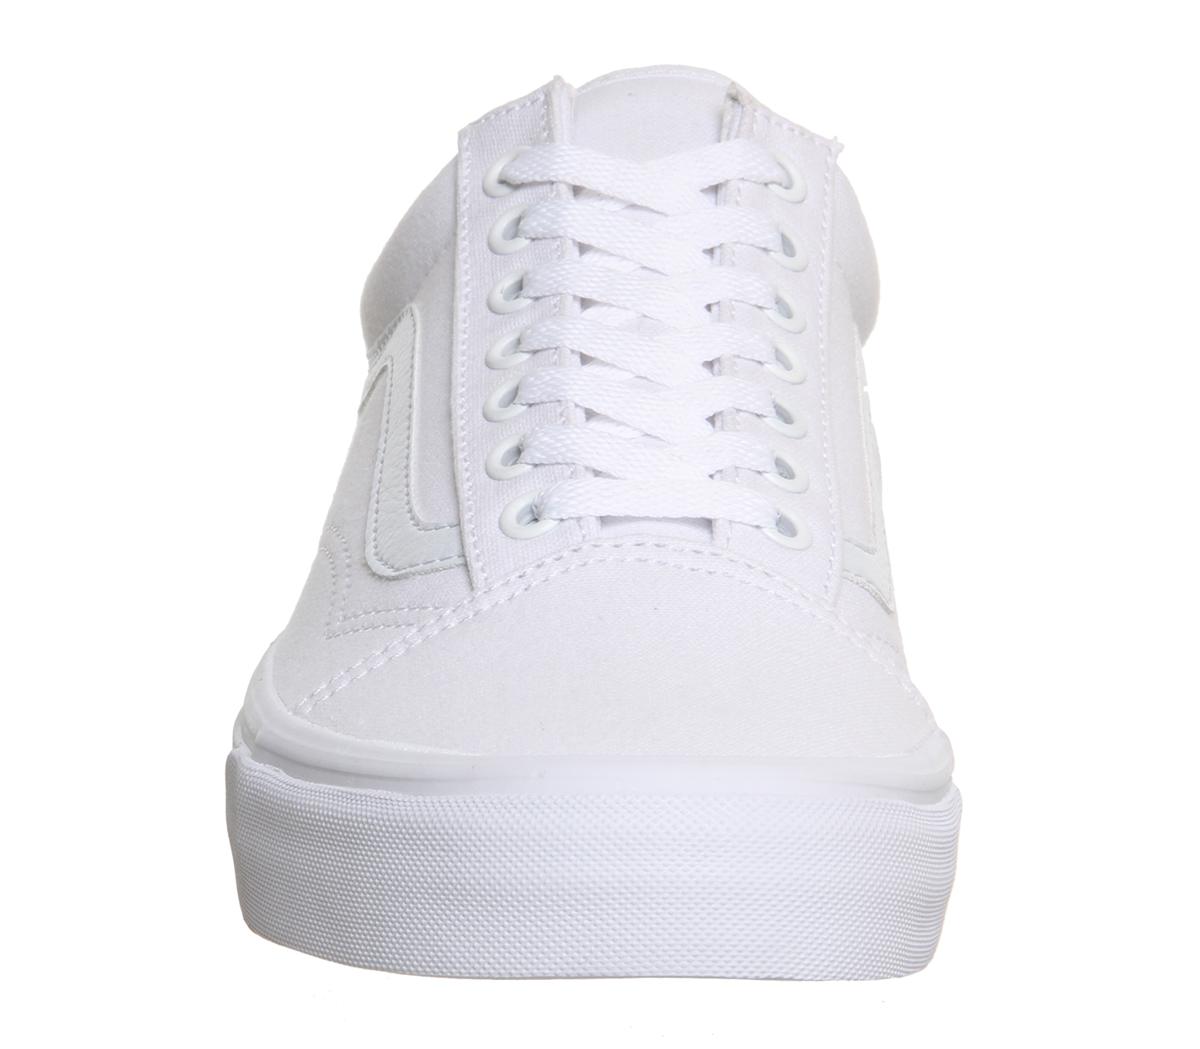 Homme Vans Old Skool toile Baskets Blanc Mono Baskets Chaussures  f8ec07f46